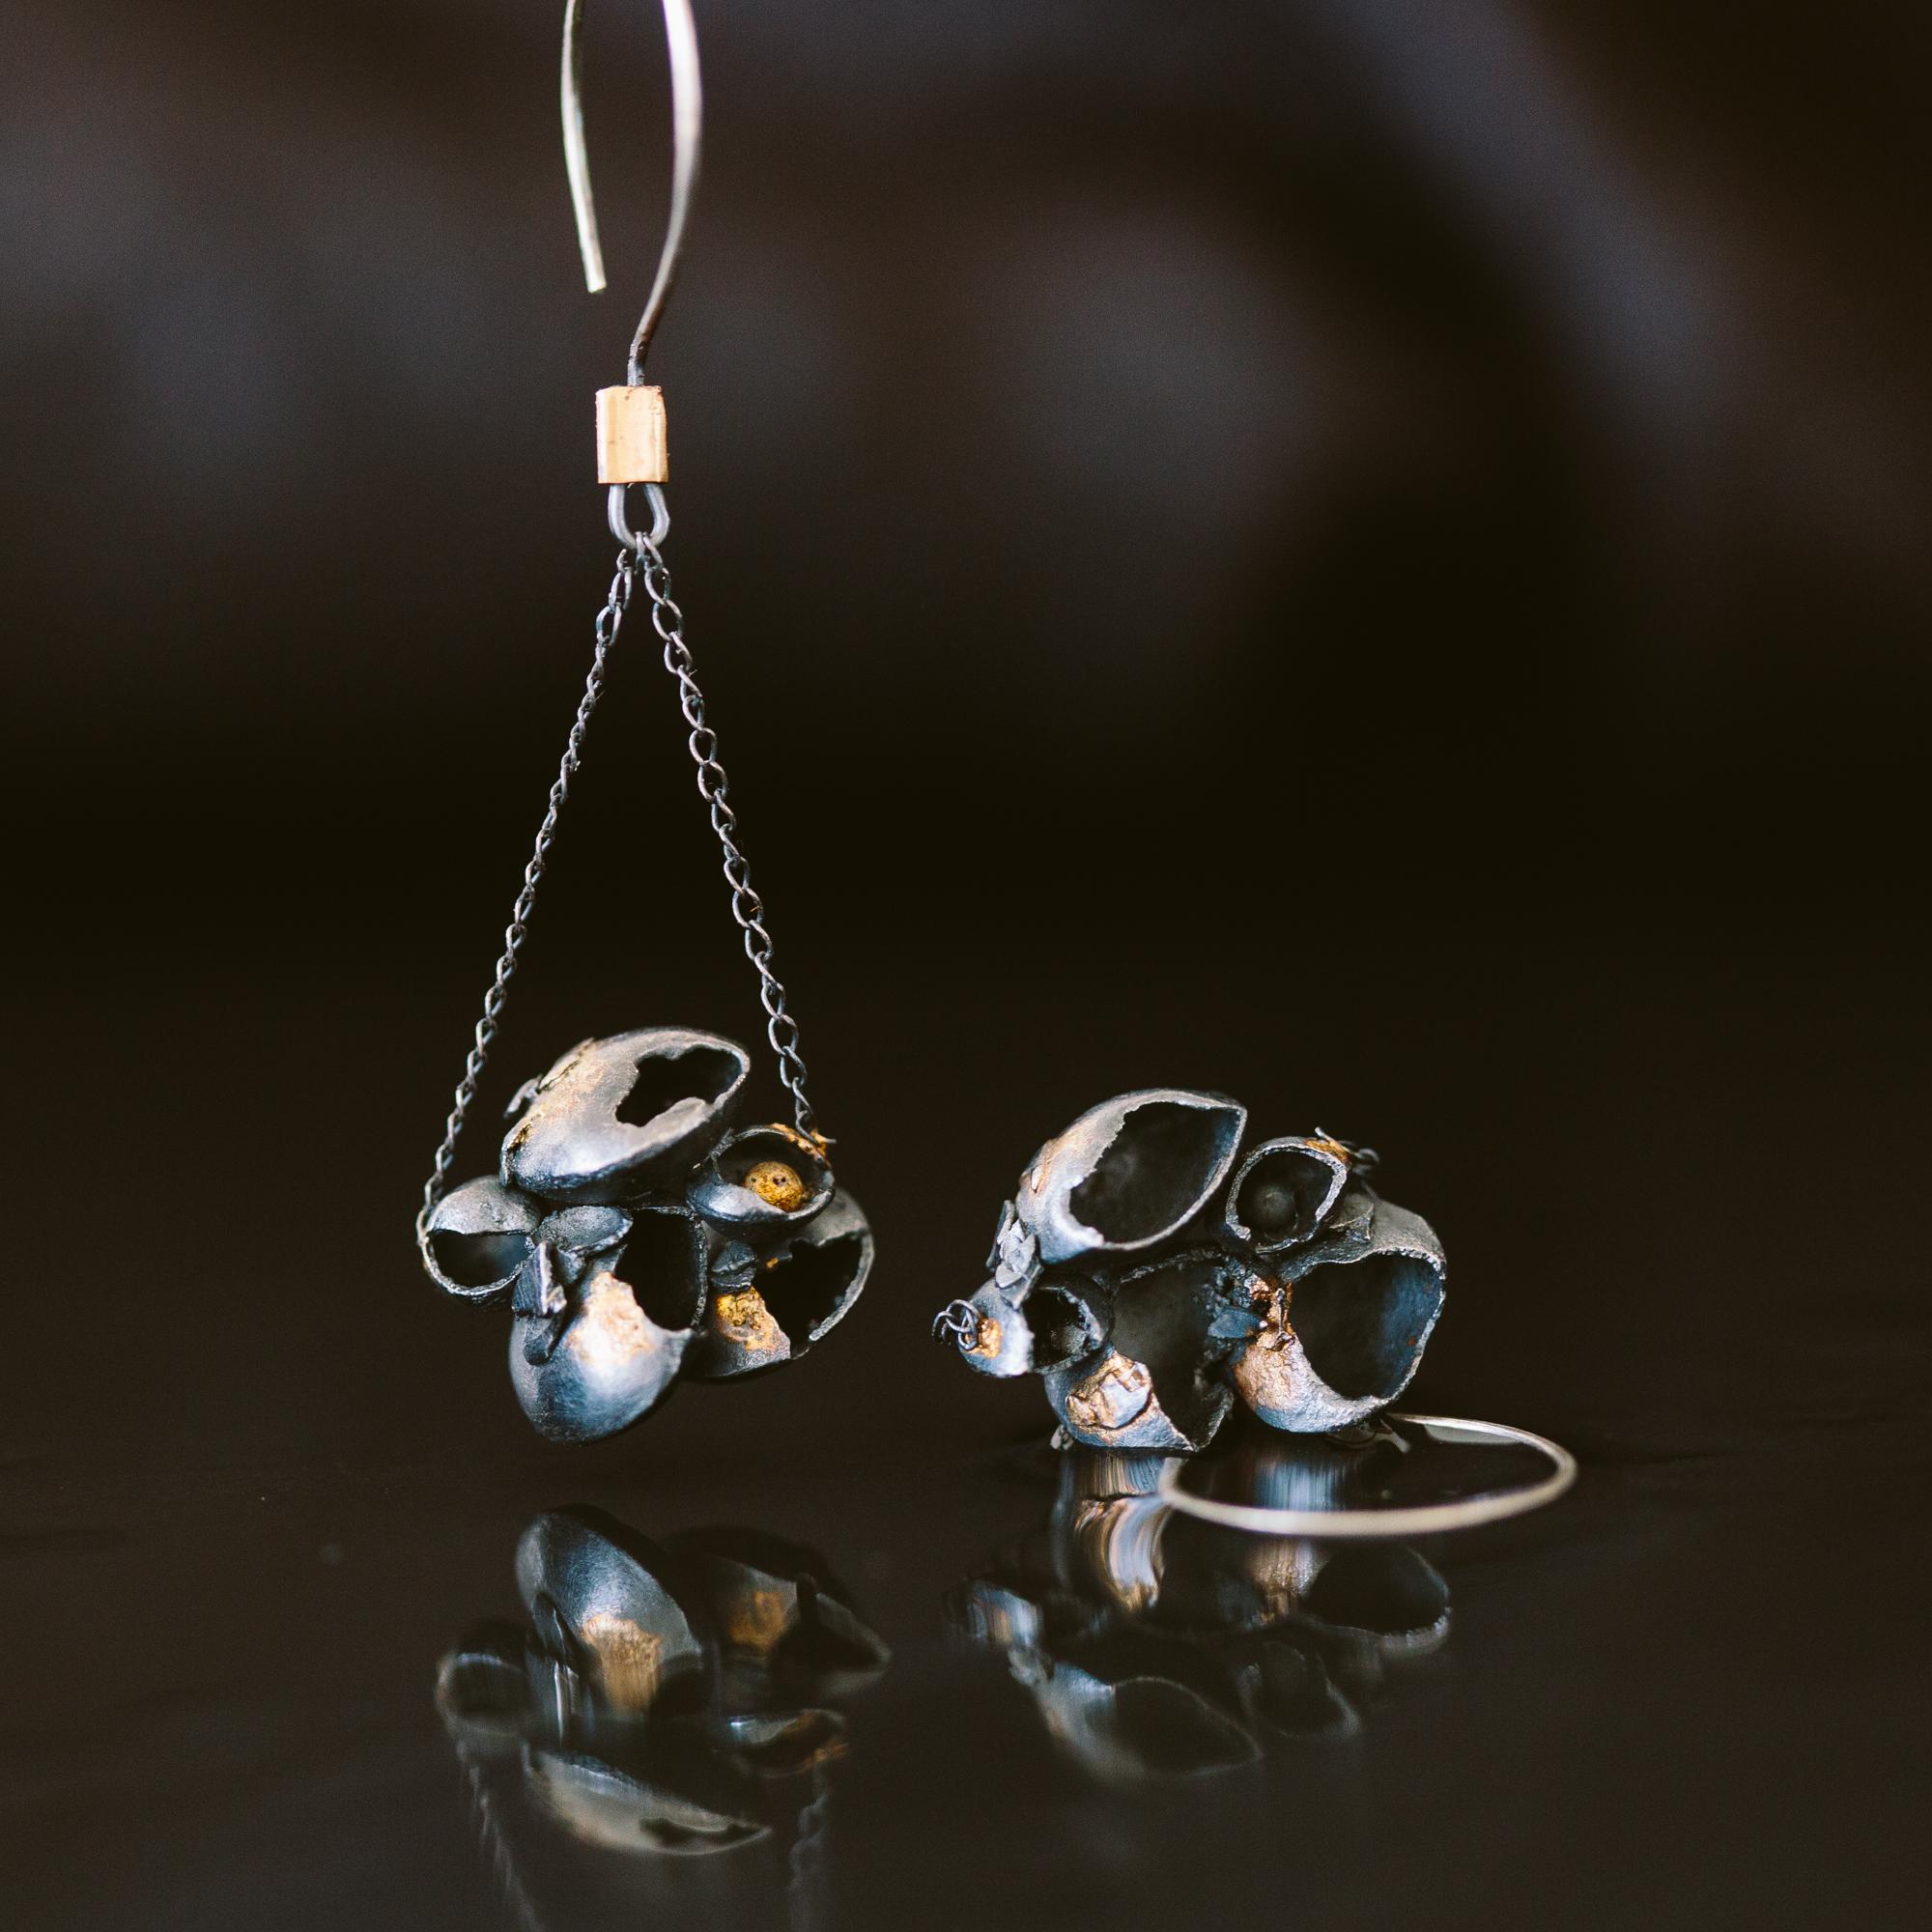 Argentium Silver, 18k Gold Earrings